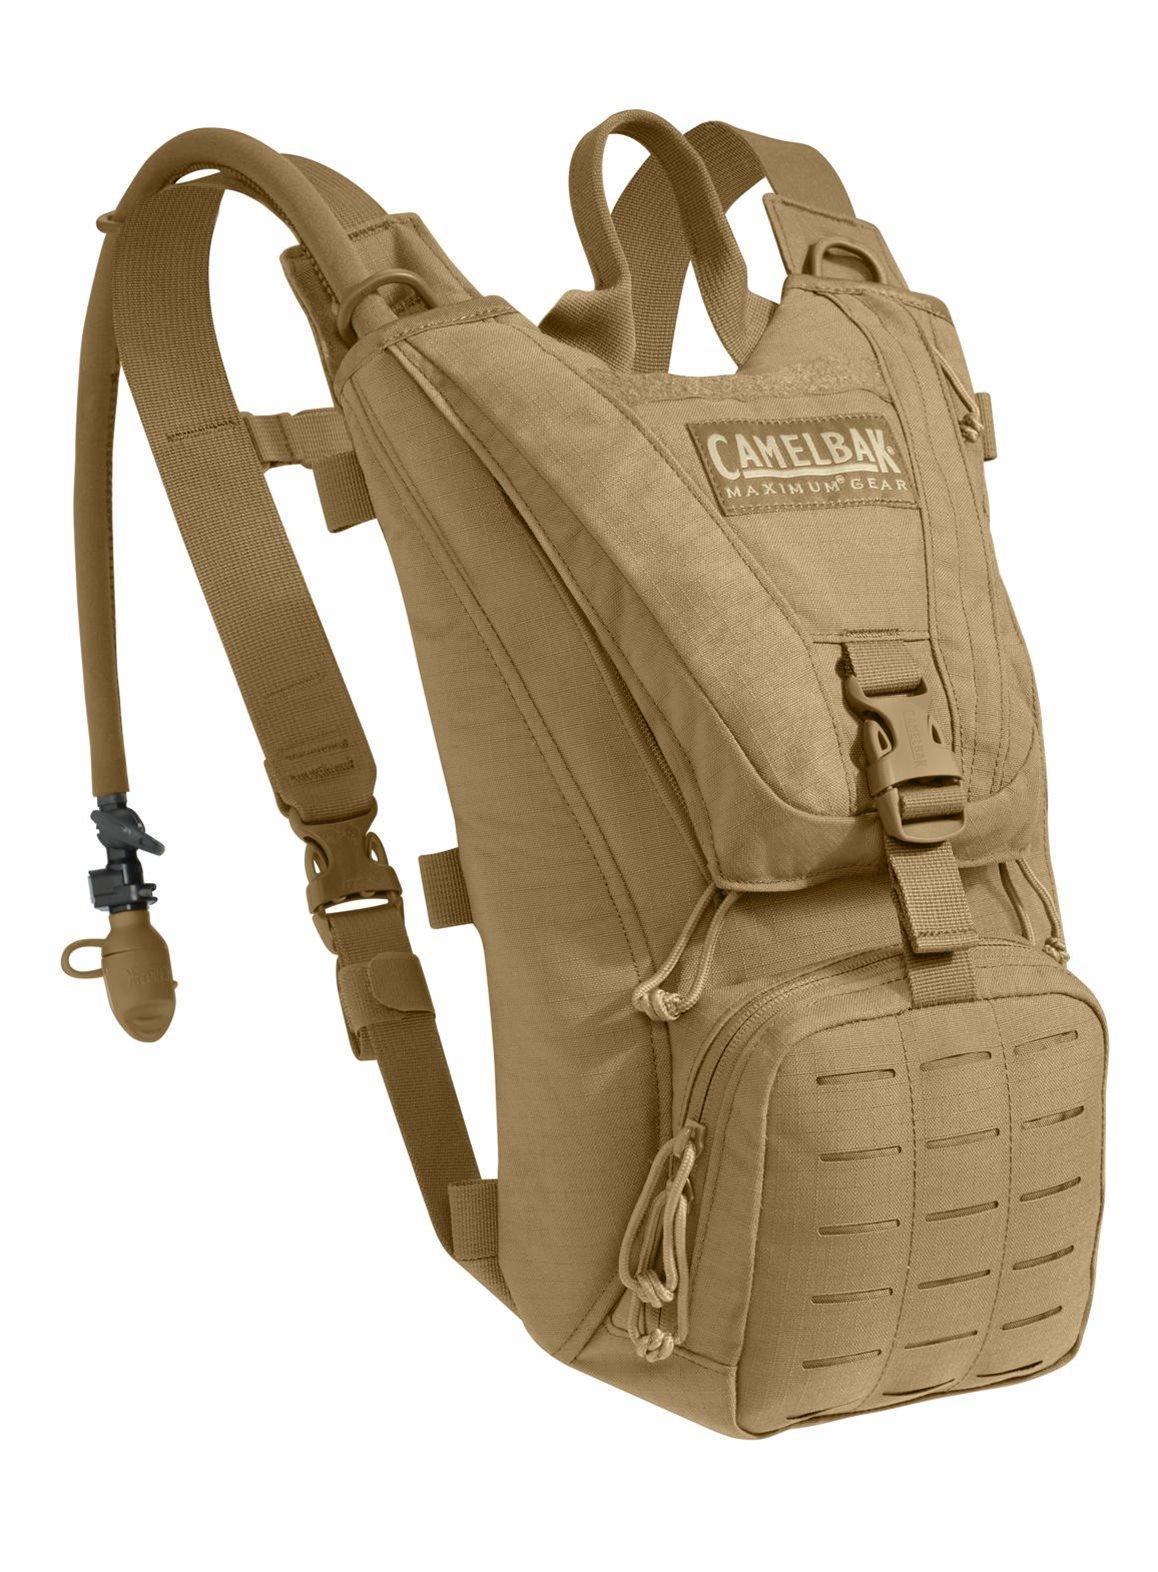 CamelBak Ambush, 100oz / 3L Mil-Spec Antidote Resevoir, Coyote Tan